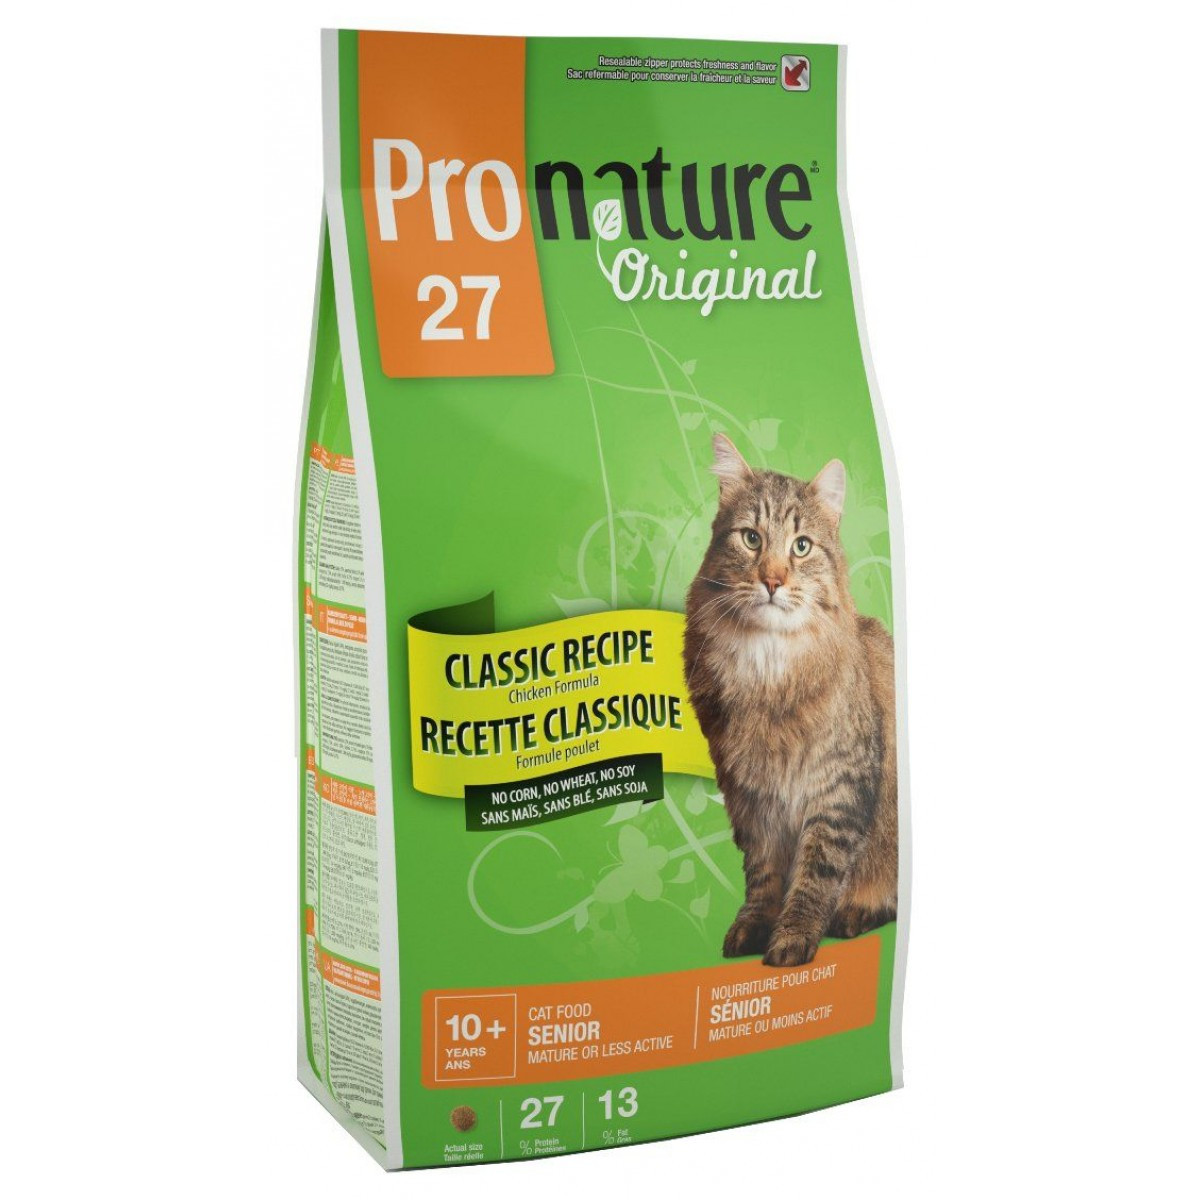 Pronature Original (Пронатюр) Cat SENIOR 5.44кг - корм для стареющих кошек от 10 лет